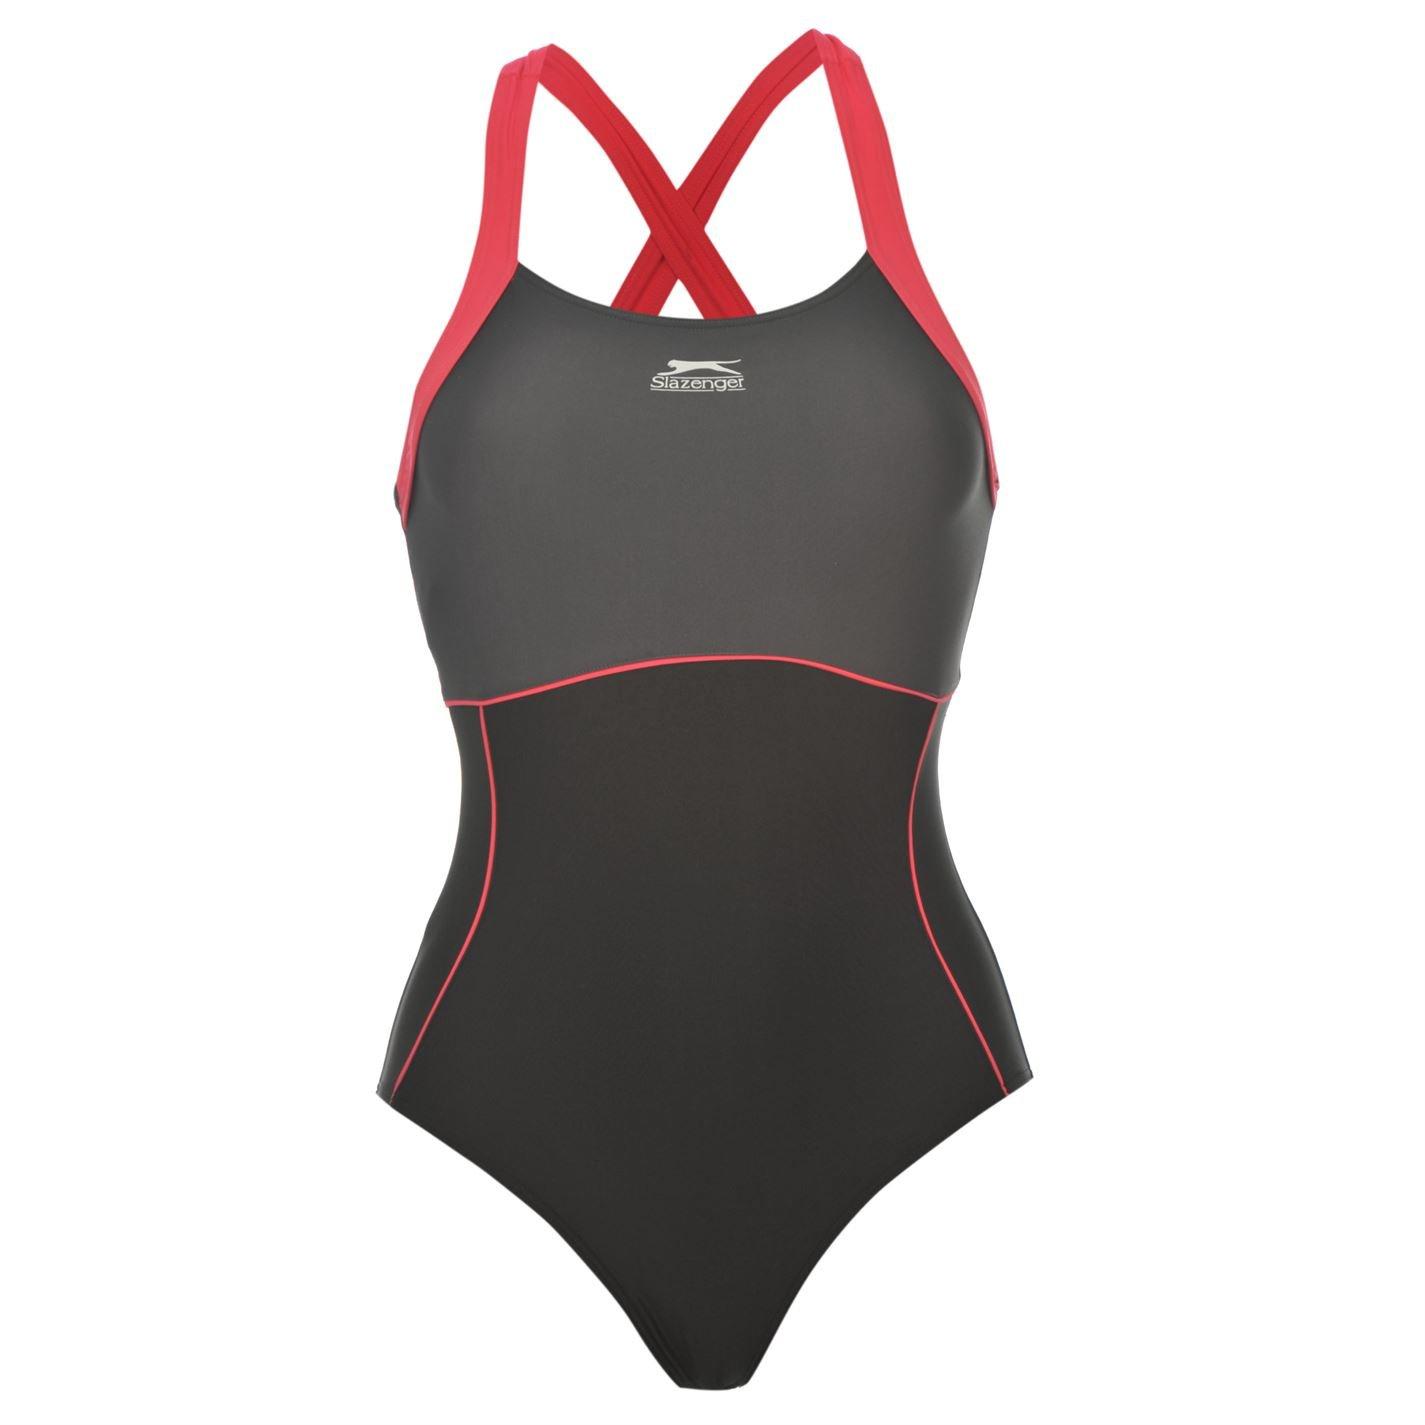 922409e481 Slazenger Womens X Back Swim Suit Ladies One Piece Swimsuit Beachwear  Swimwear: Amazon.co.uk: Clothing